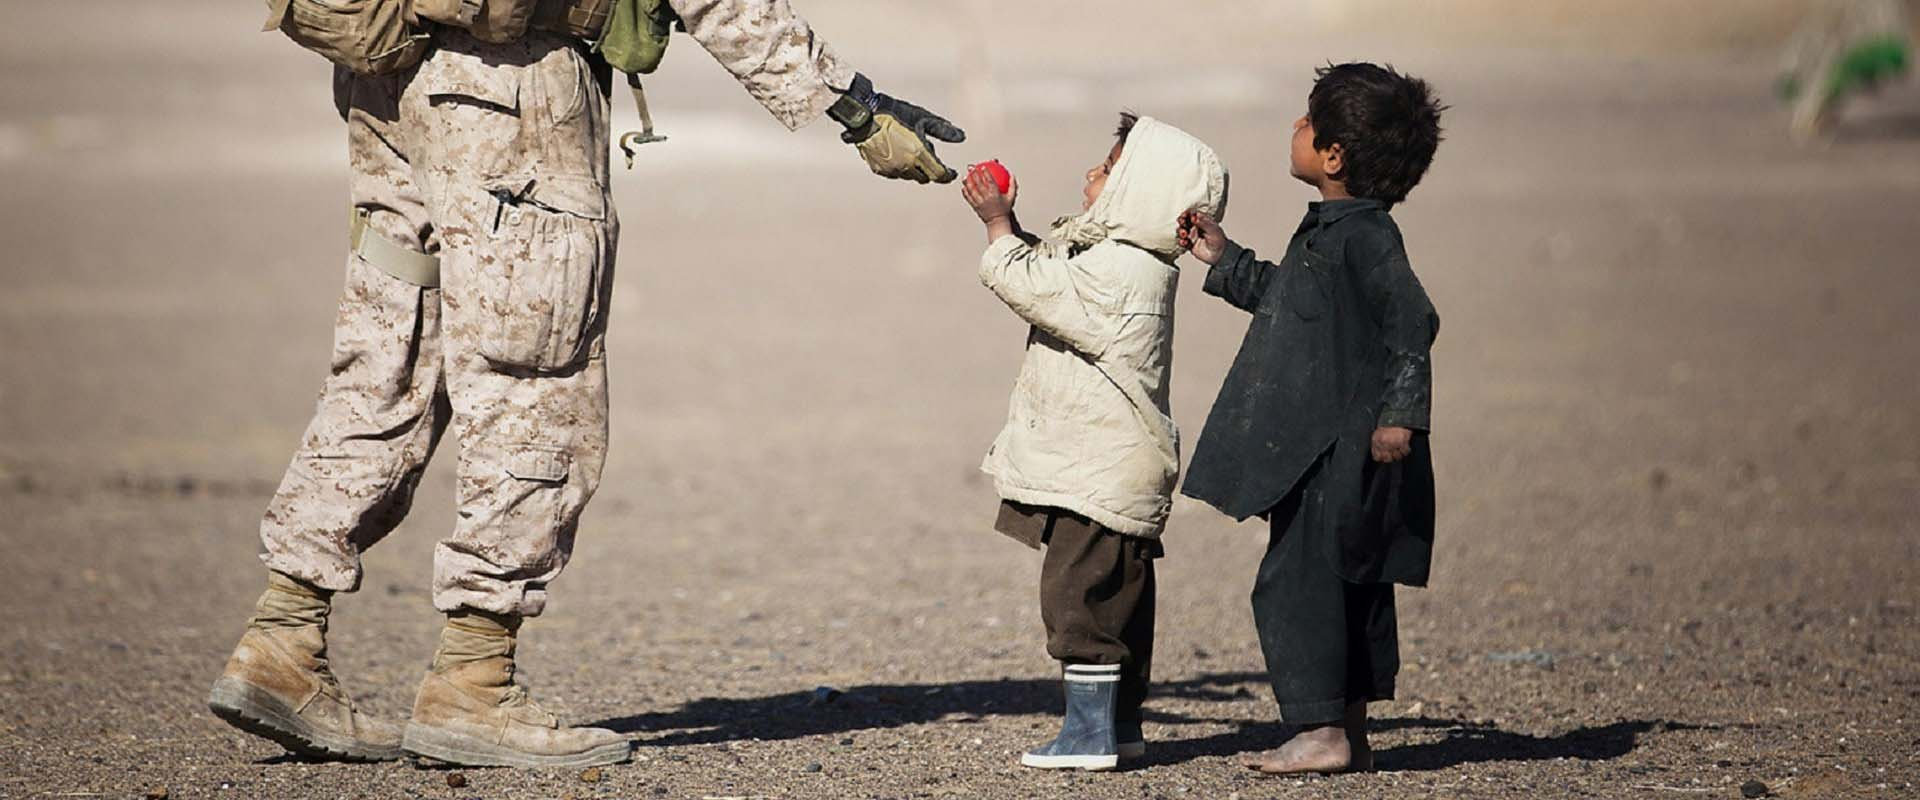 Ahmed en Iraq